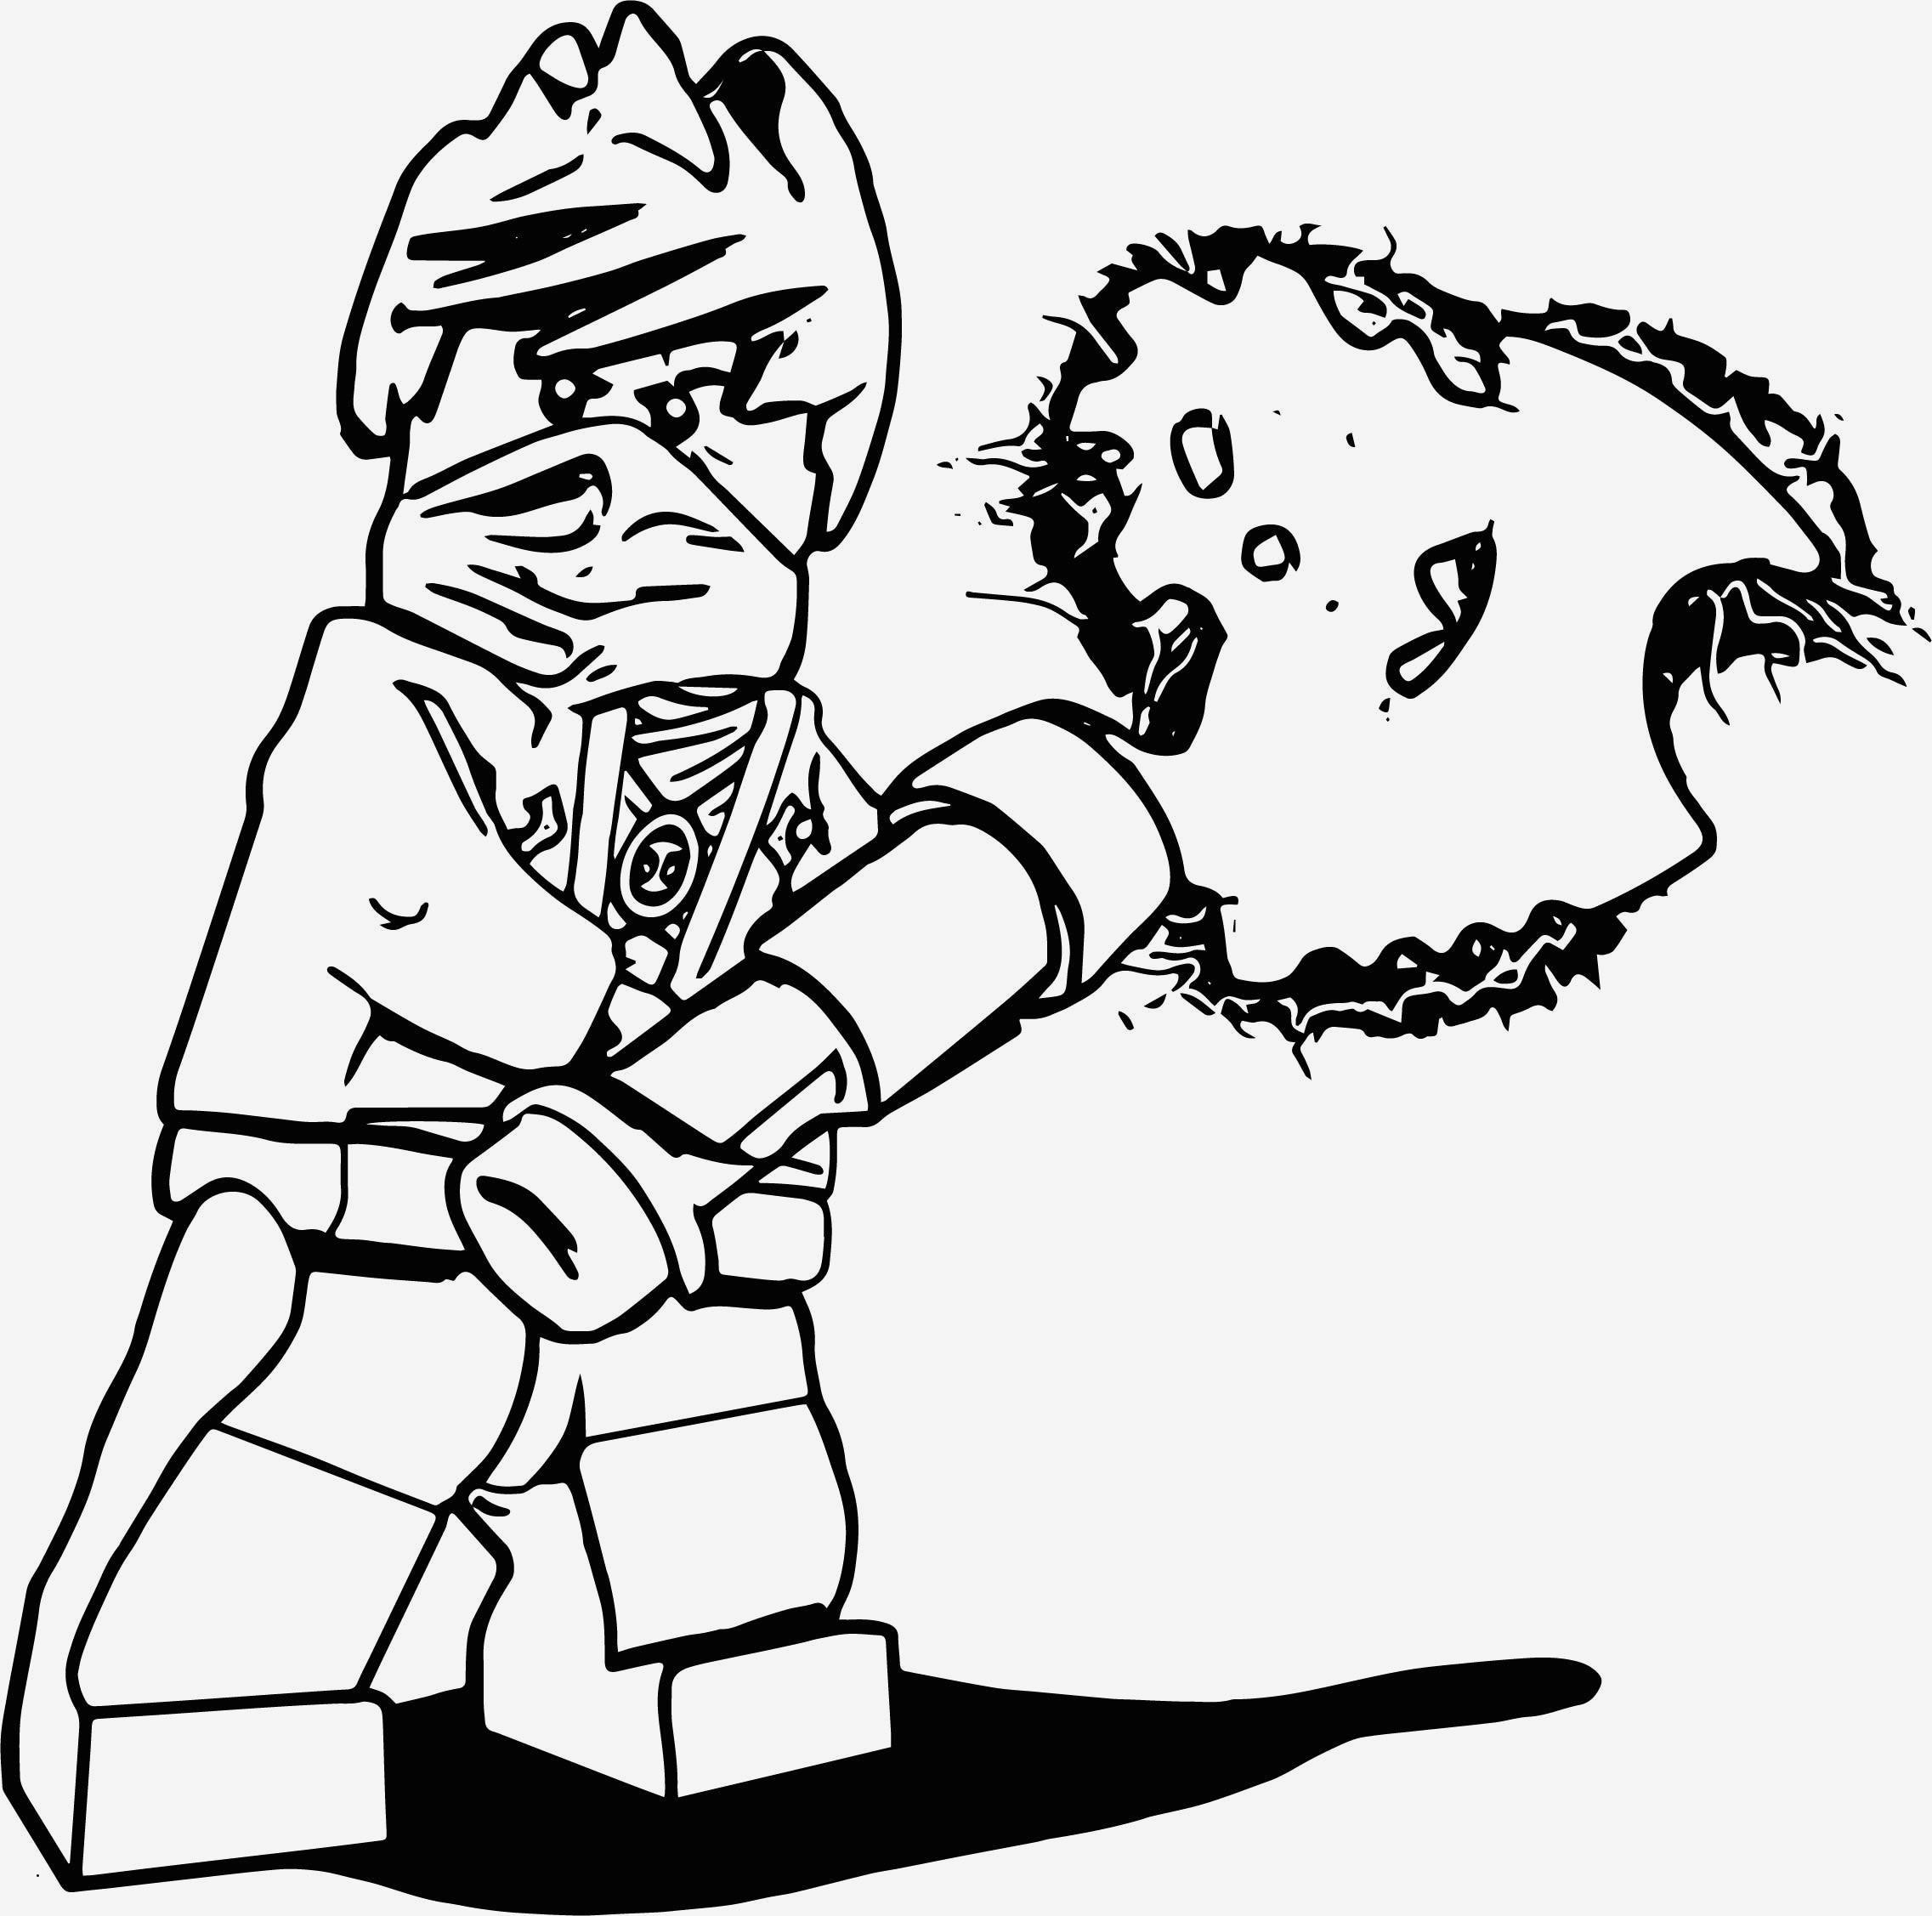 Ninjago Jay Ausmalbild Frisch 48 Motiv Lego Ninjago Ausmalbilder Cole Treehouse Nyc Bild